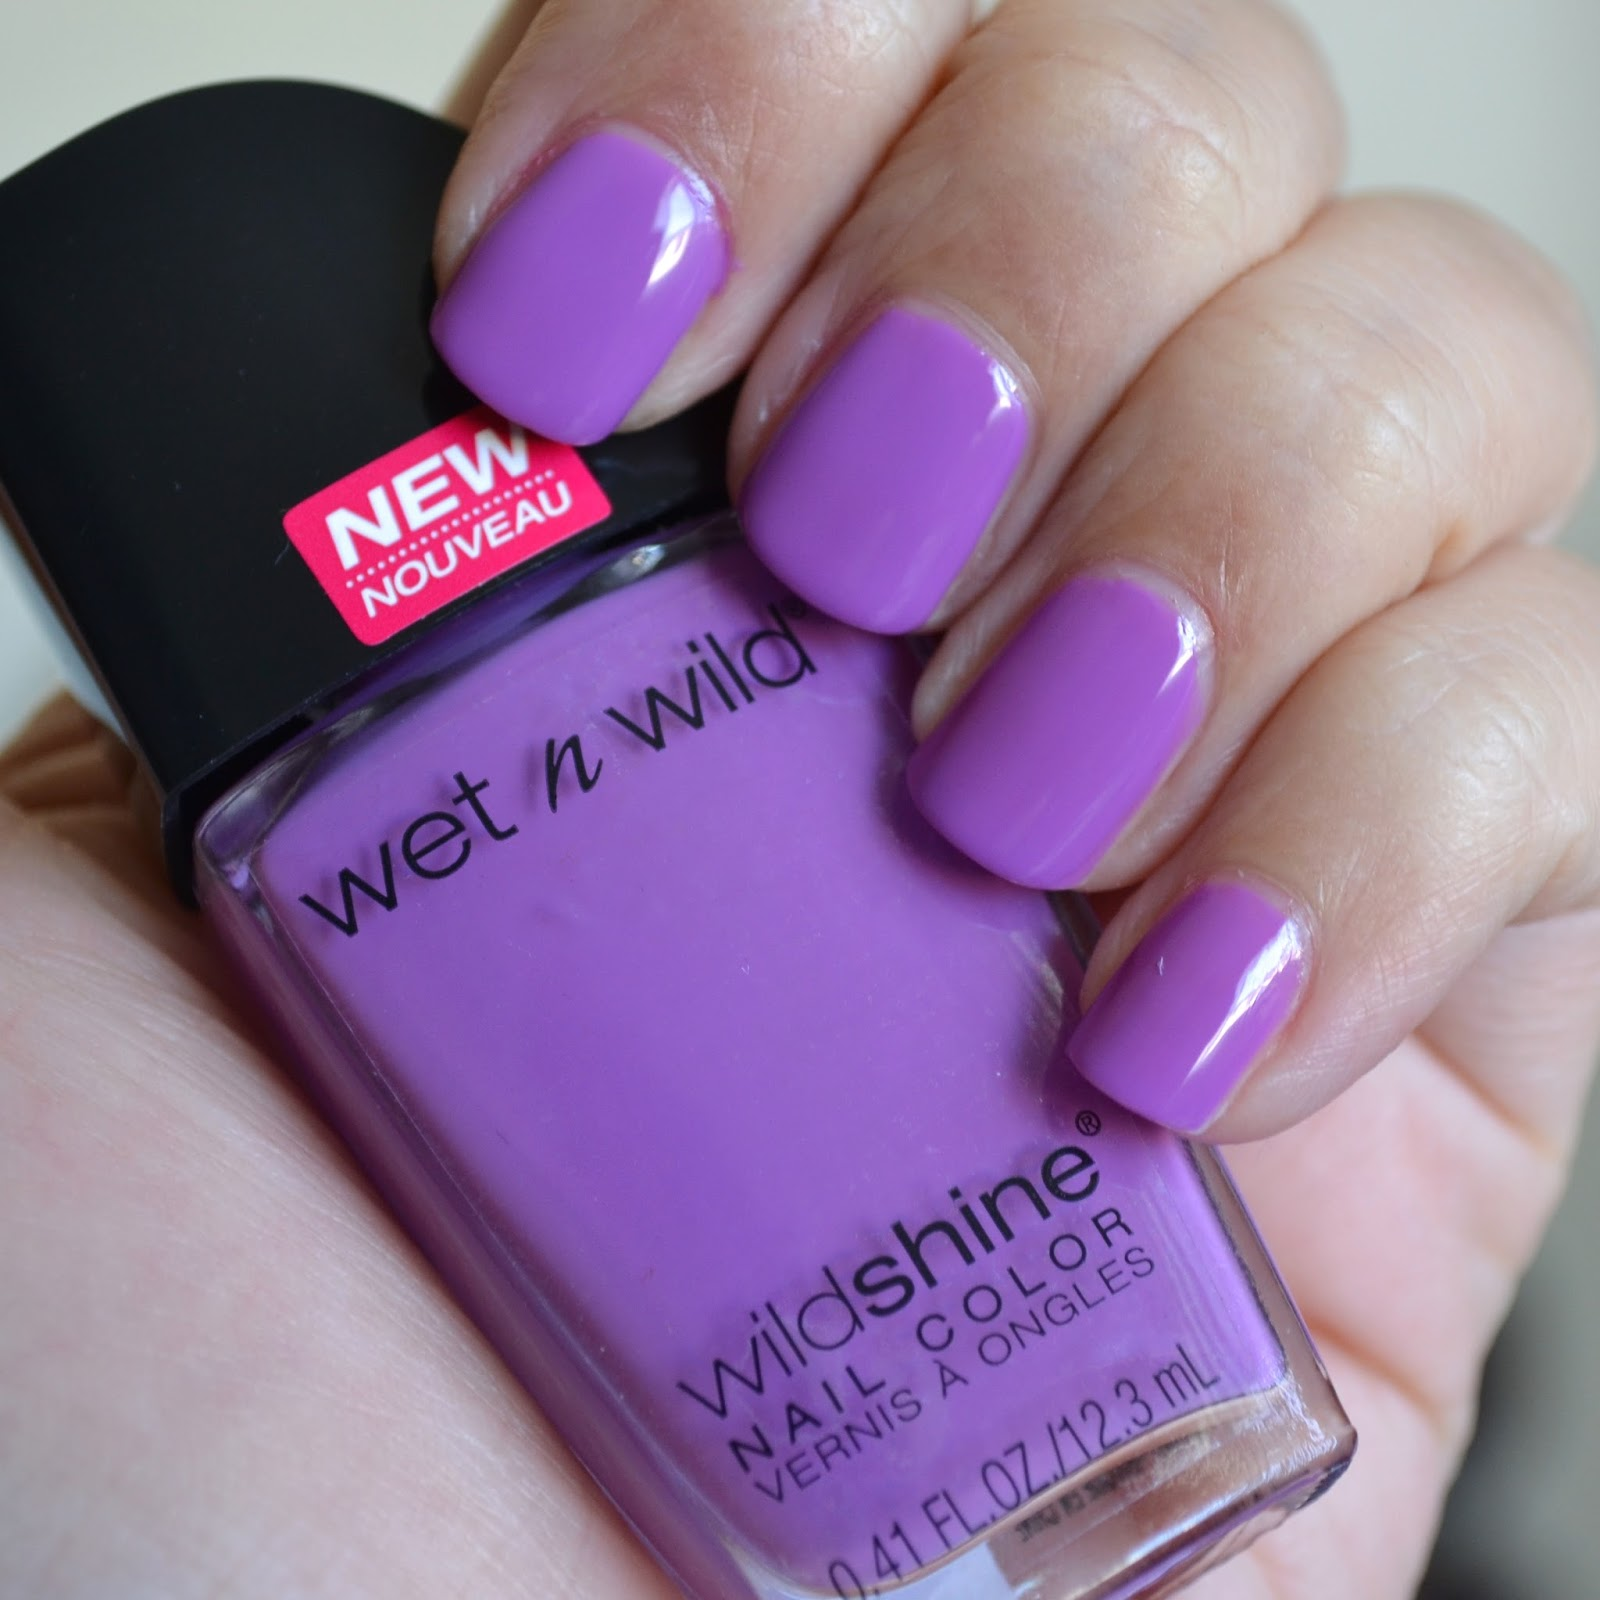 Aquaheart: Wet N Wild Silk Finish Lipsticks And Wild Shine